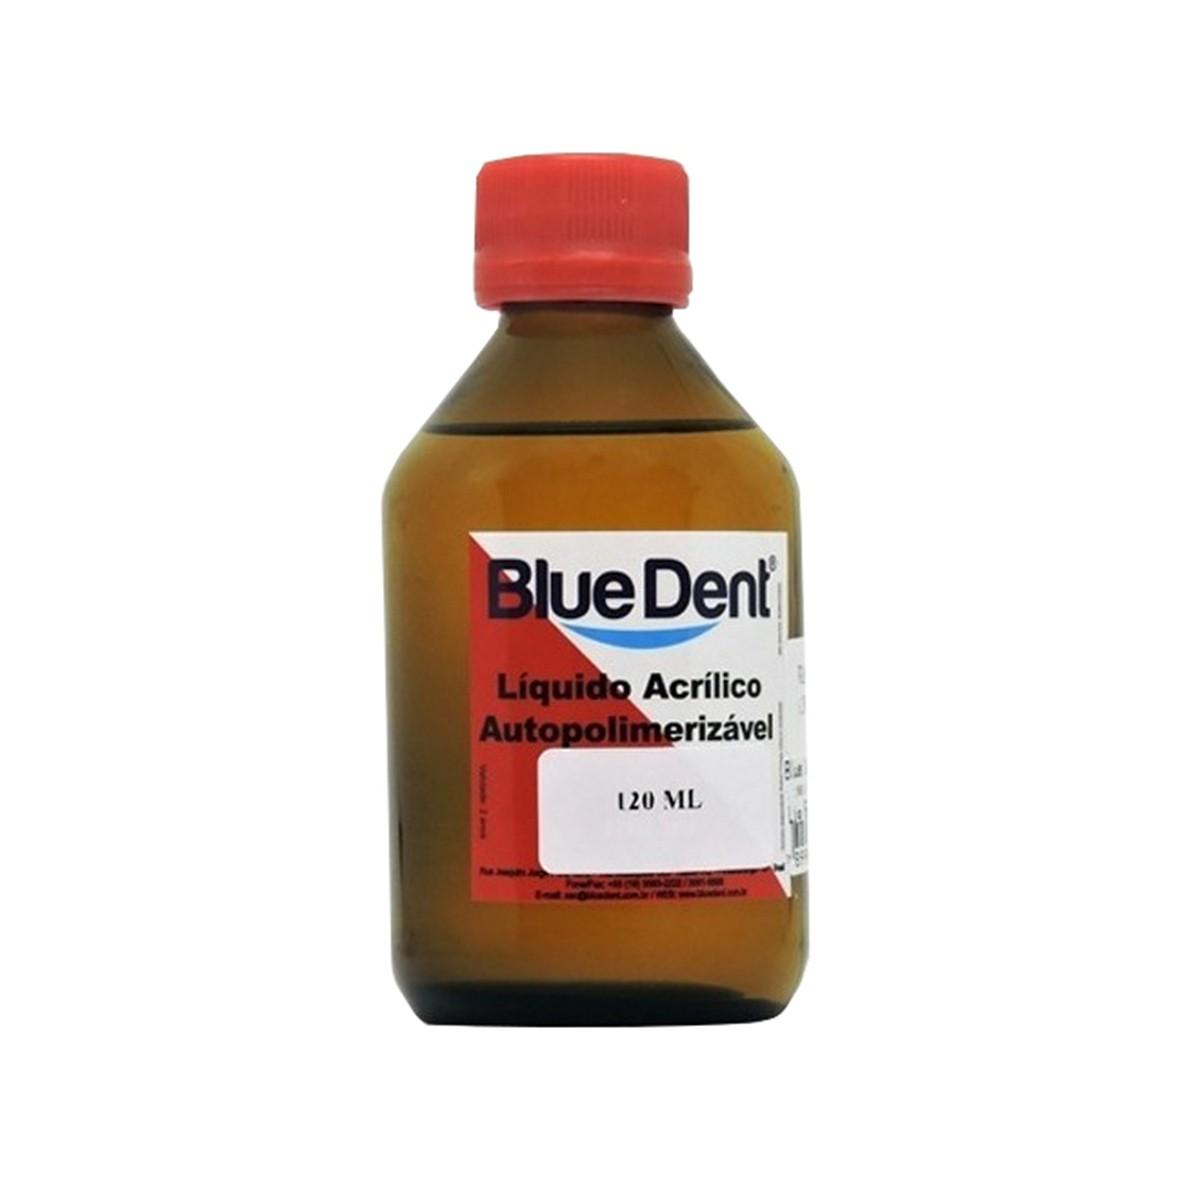 Resina Autopolimerizavel Blue Dent 120ml